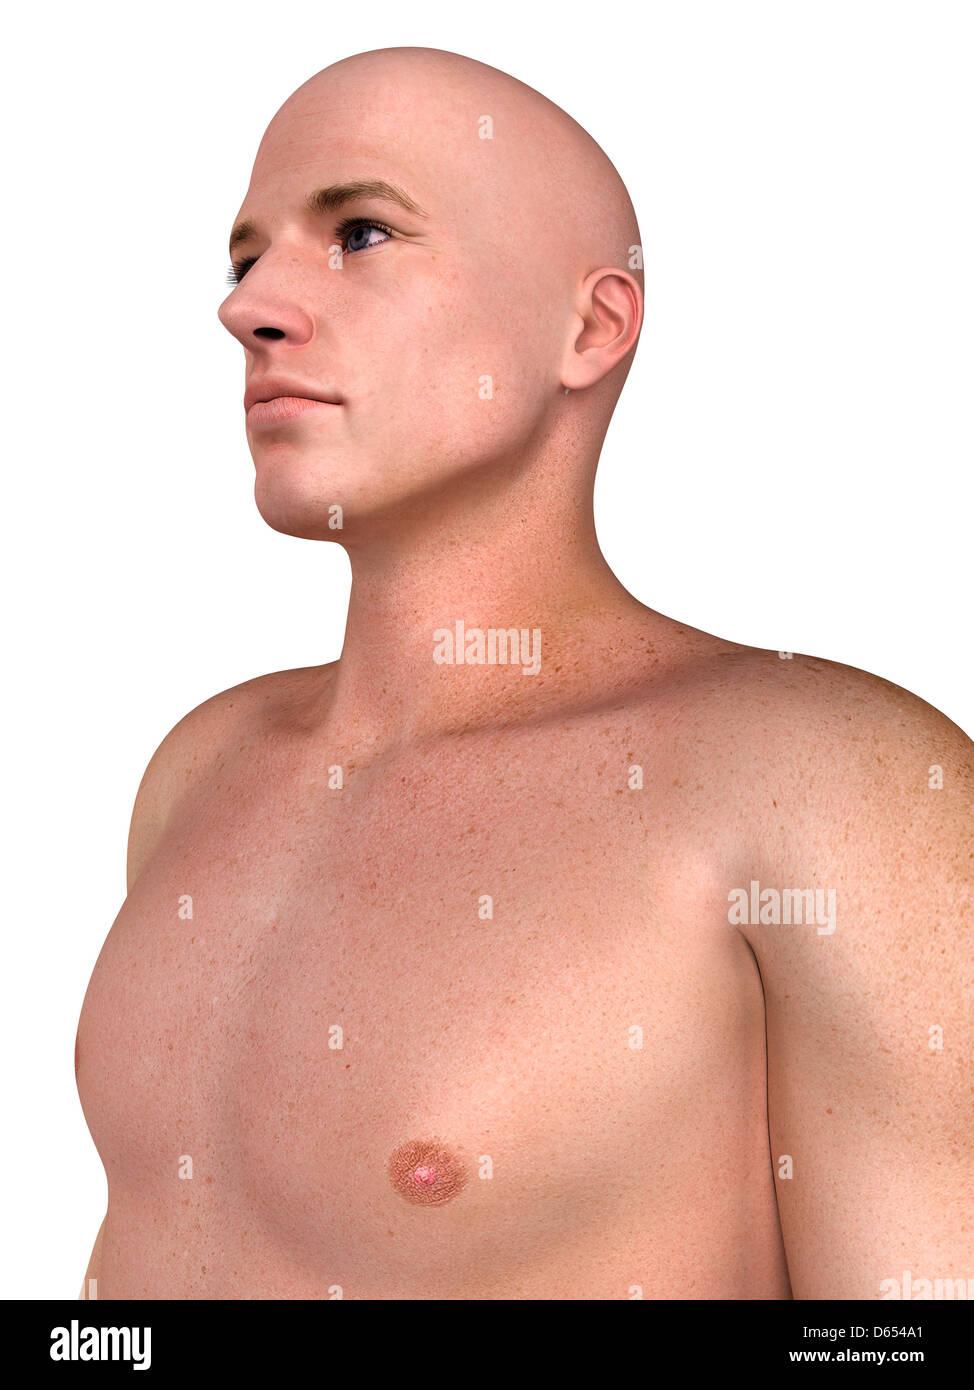 Haut du corps masculin, artwork Photo Stock